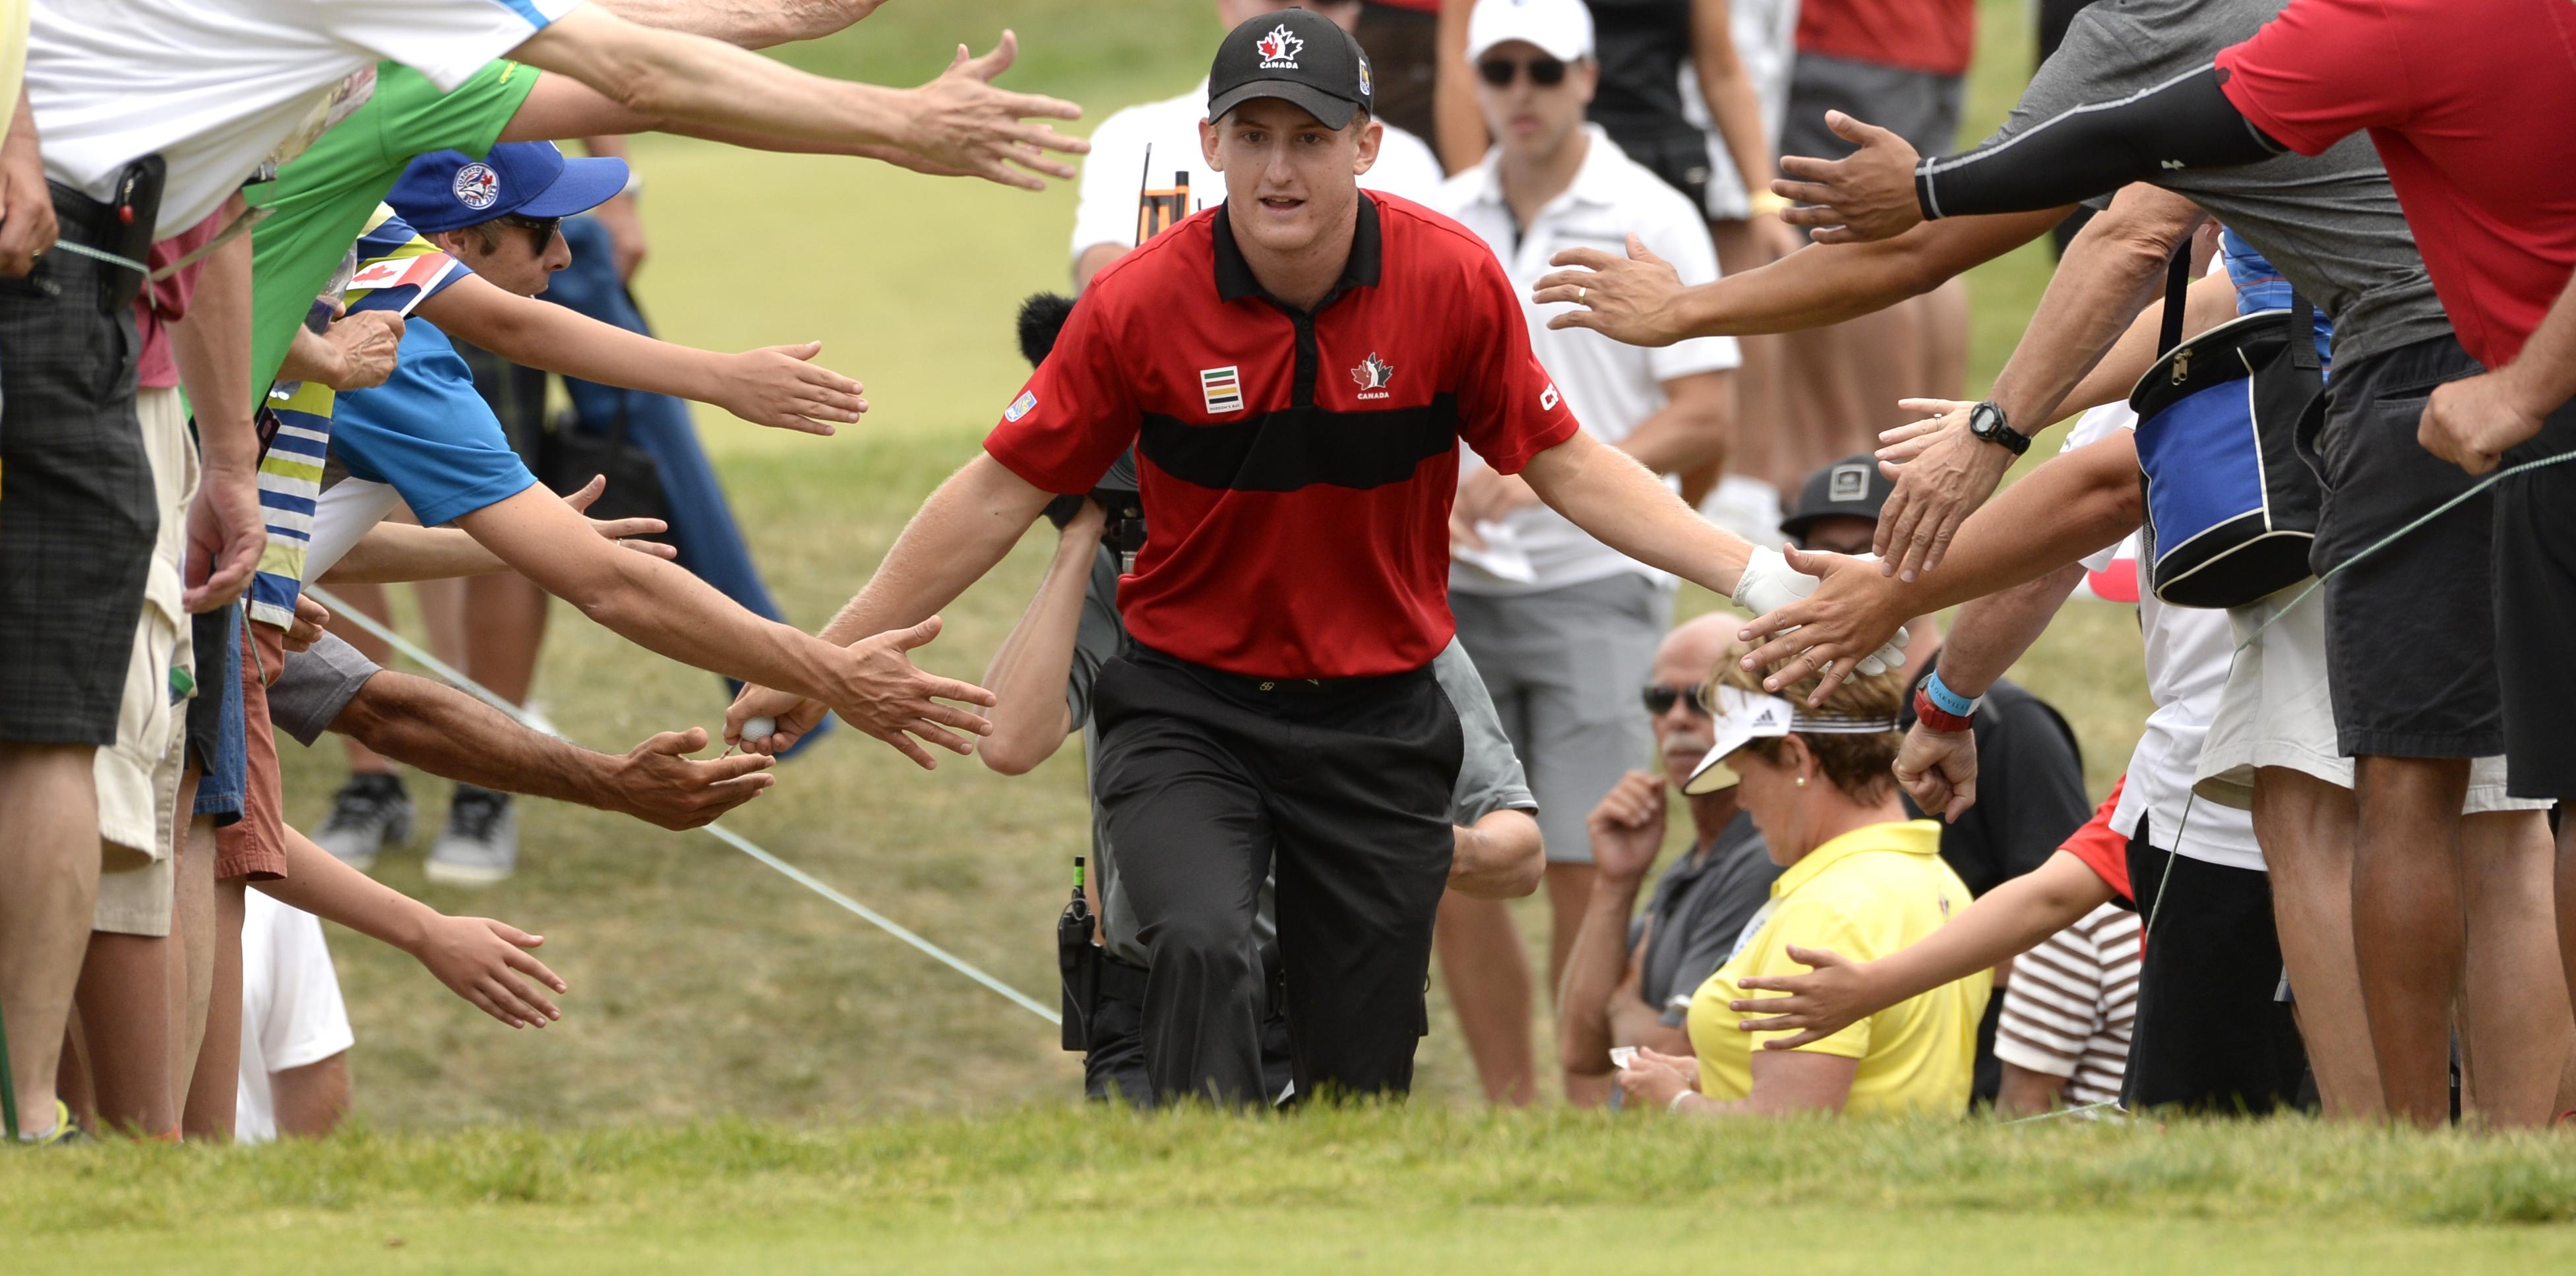 Du Toit Comes Up Short At Rbc Canadian Open But Wins Fans Golf Canada